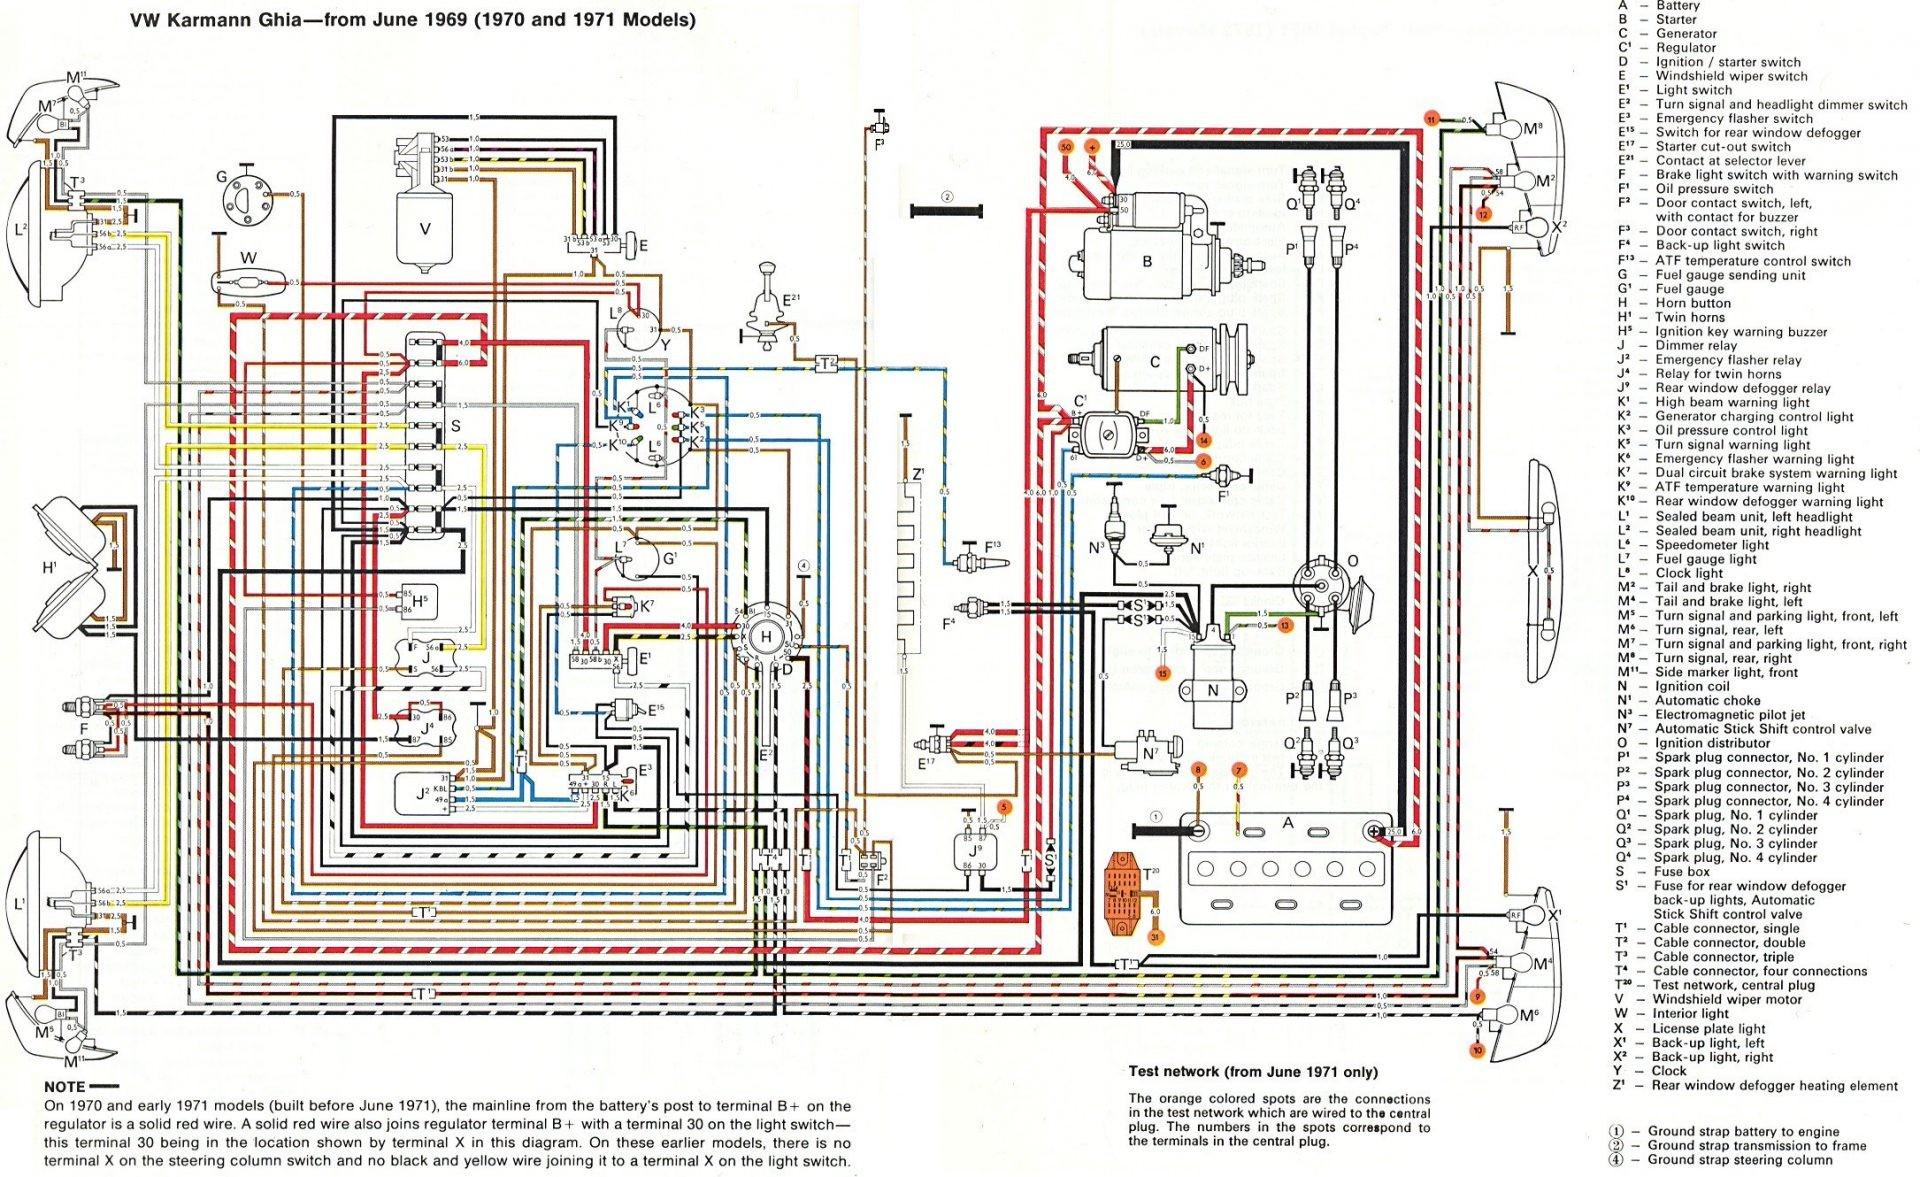 1967 Firebird Wiring Diagram 1969 Pontiac Wiring Diagram Wiring Diagram Of 1967 Firebird Wiring Diagram